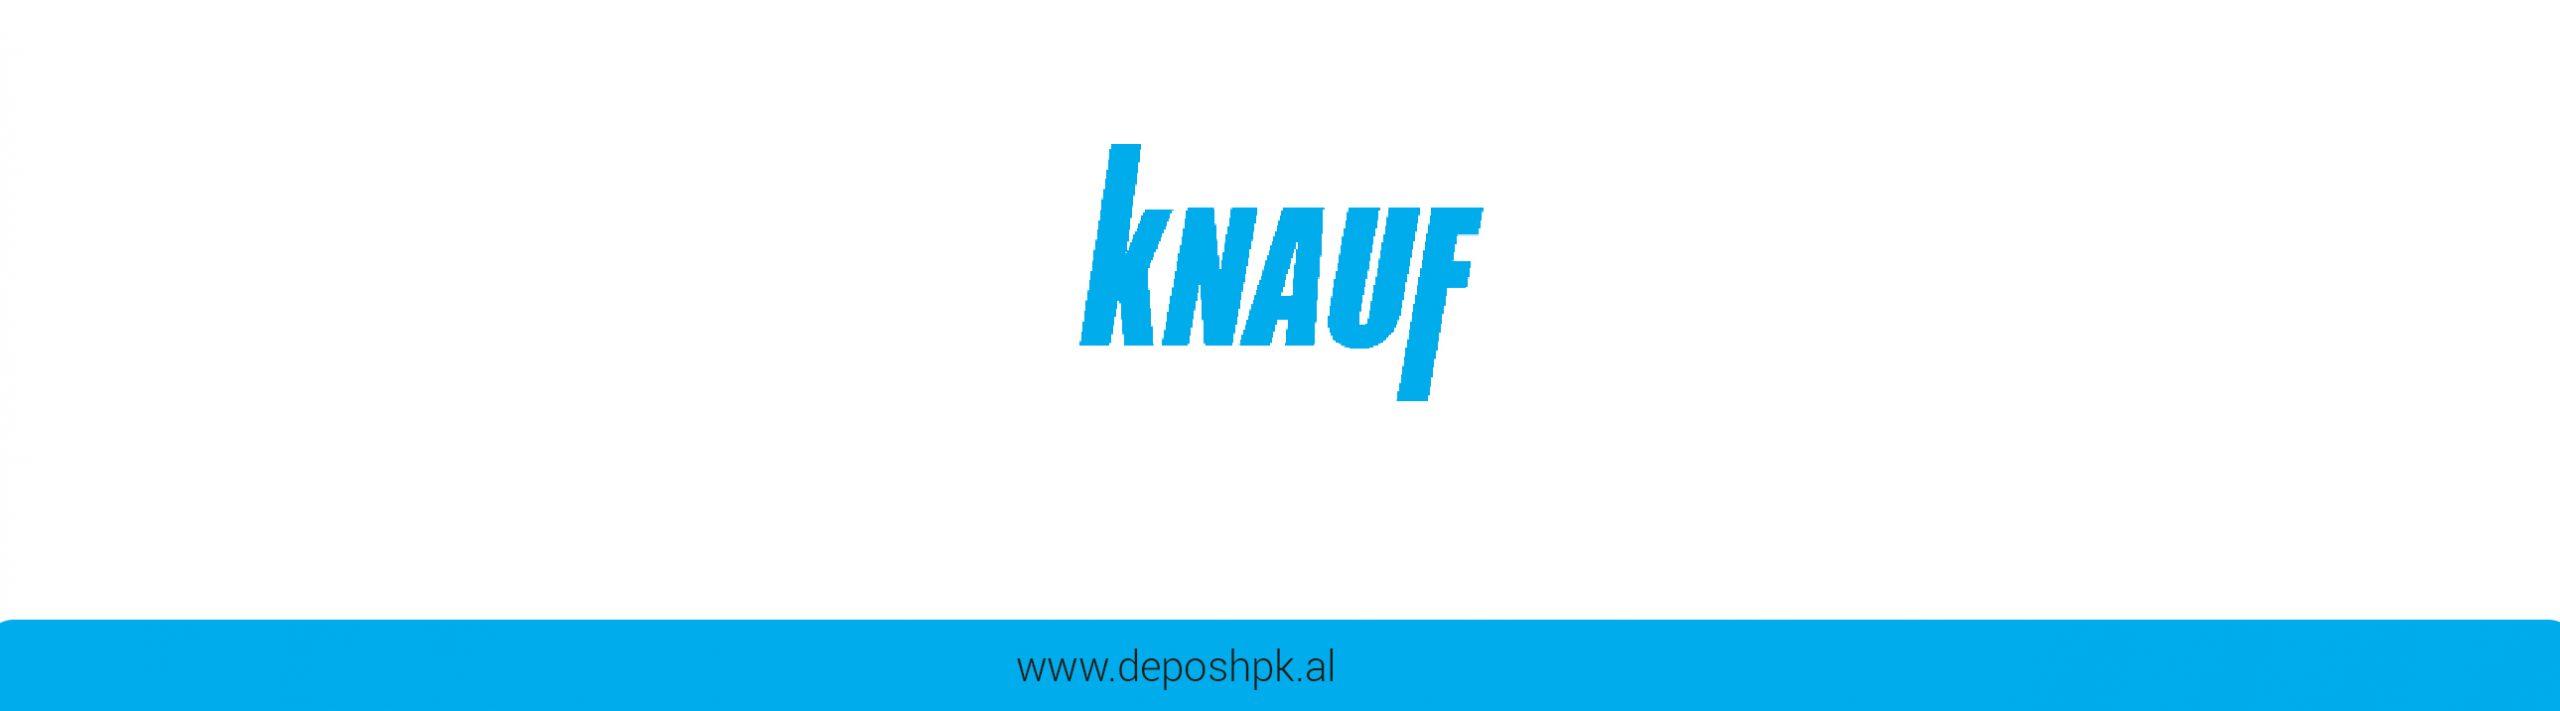 https://www.deposhpk.al/wp-content/uploads/2019/12/knauf-produkt-deposhpk.al_-1-scaled.jpg